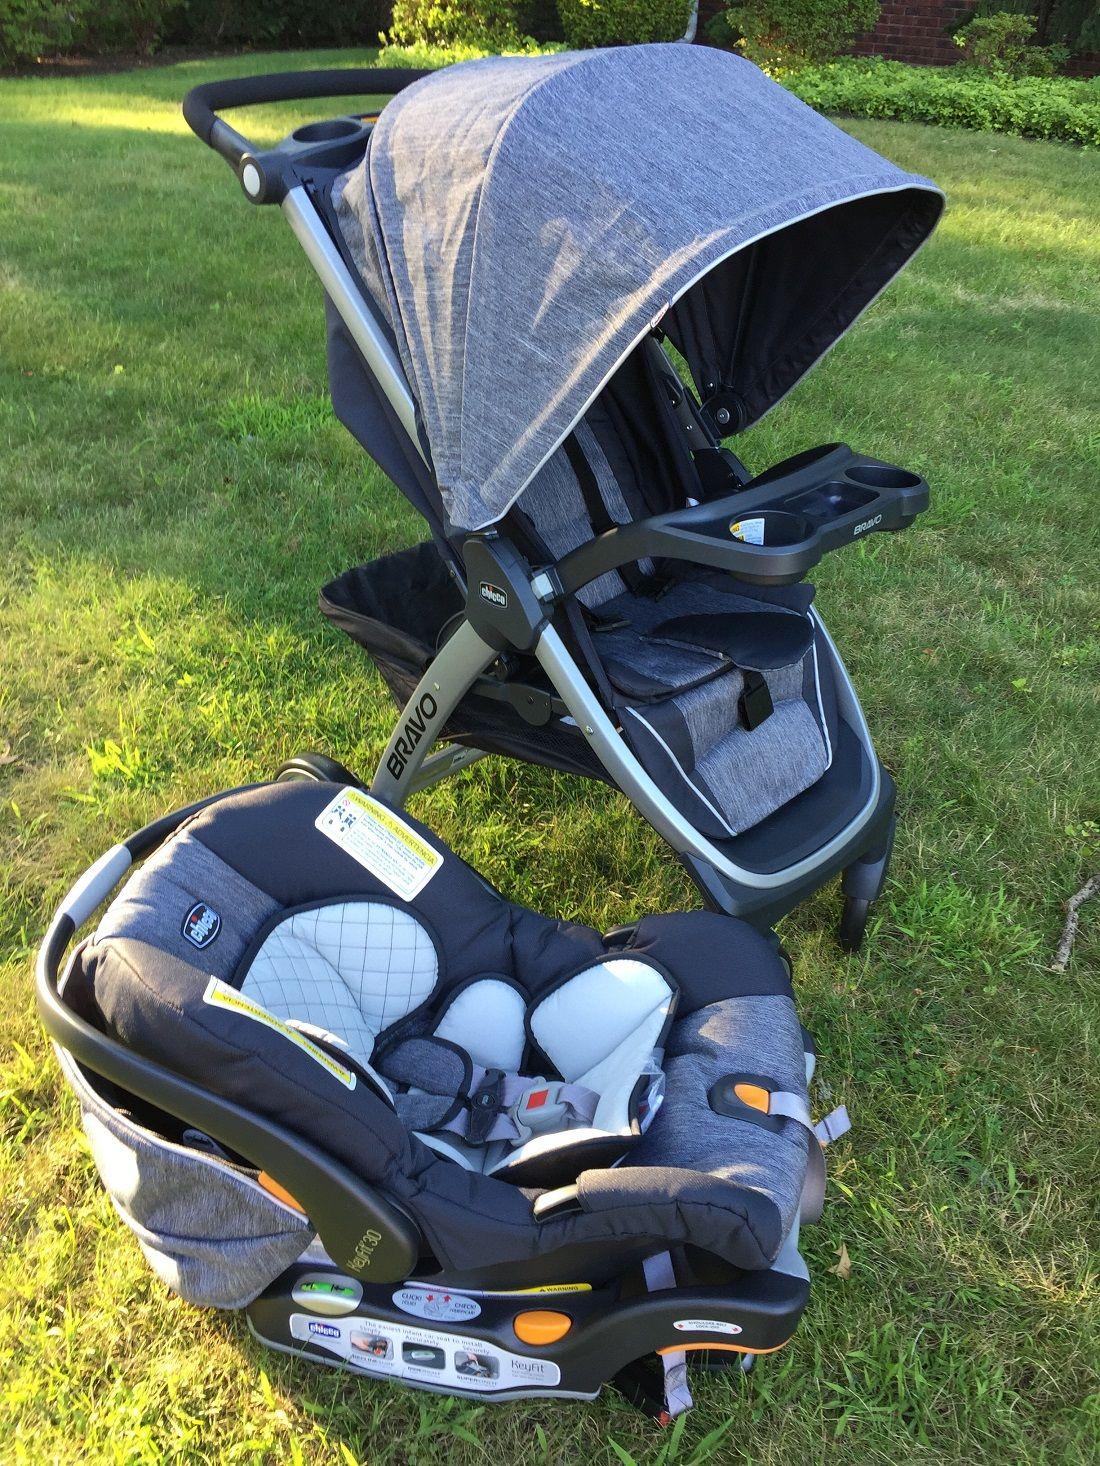 Gorgeous Baby Gear Co Travel System Indigo Co Viaro Travel System Buy Buy Baby Co Viaro Travel System Dune Co Bravo Trio System Babies Travel baby Chicco Viaro Travel System